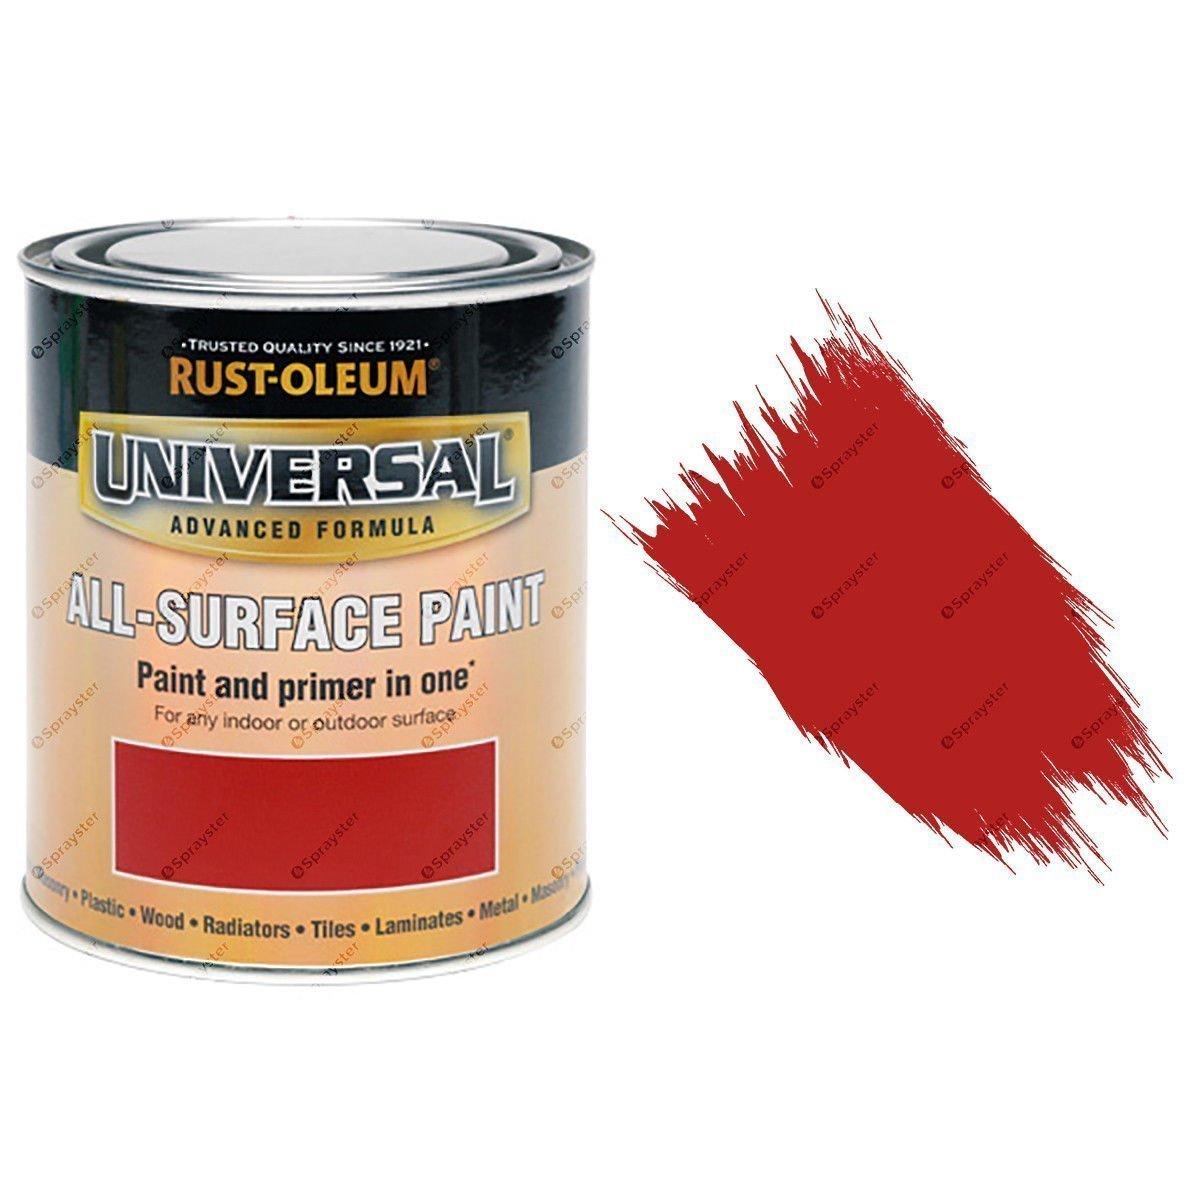 Rust-Oleum-Universal-All-Surface-Self-Prime-Brush-Paint-Gloss-Cardinal-Red-750ml-332563353682